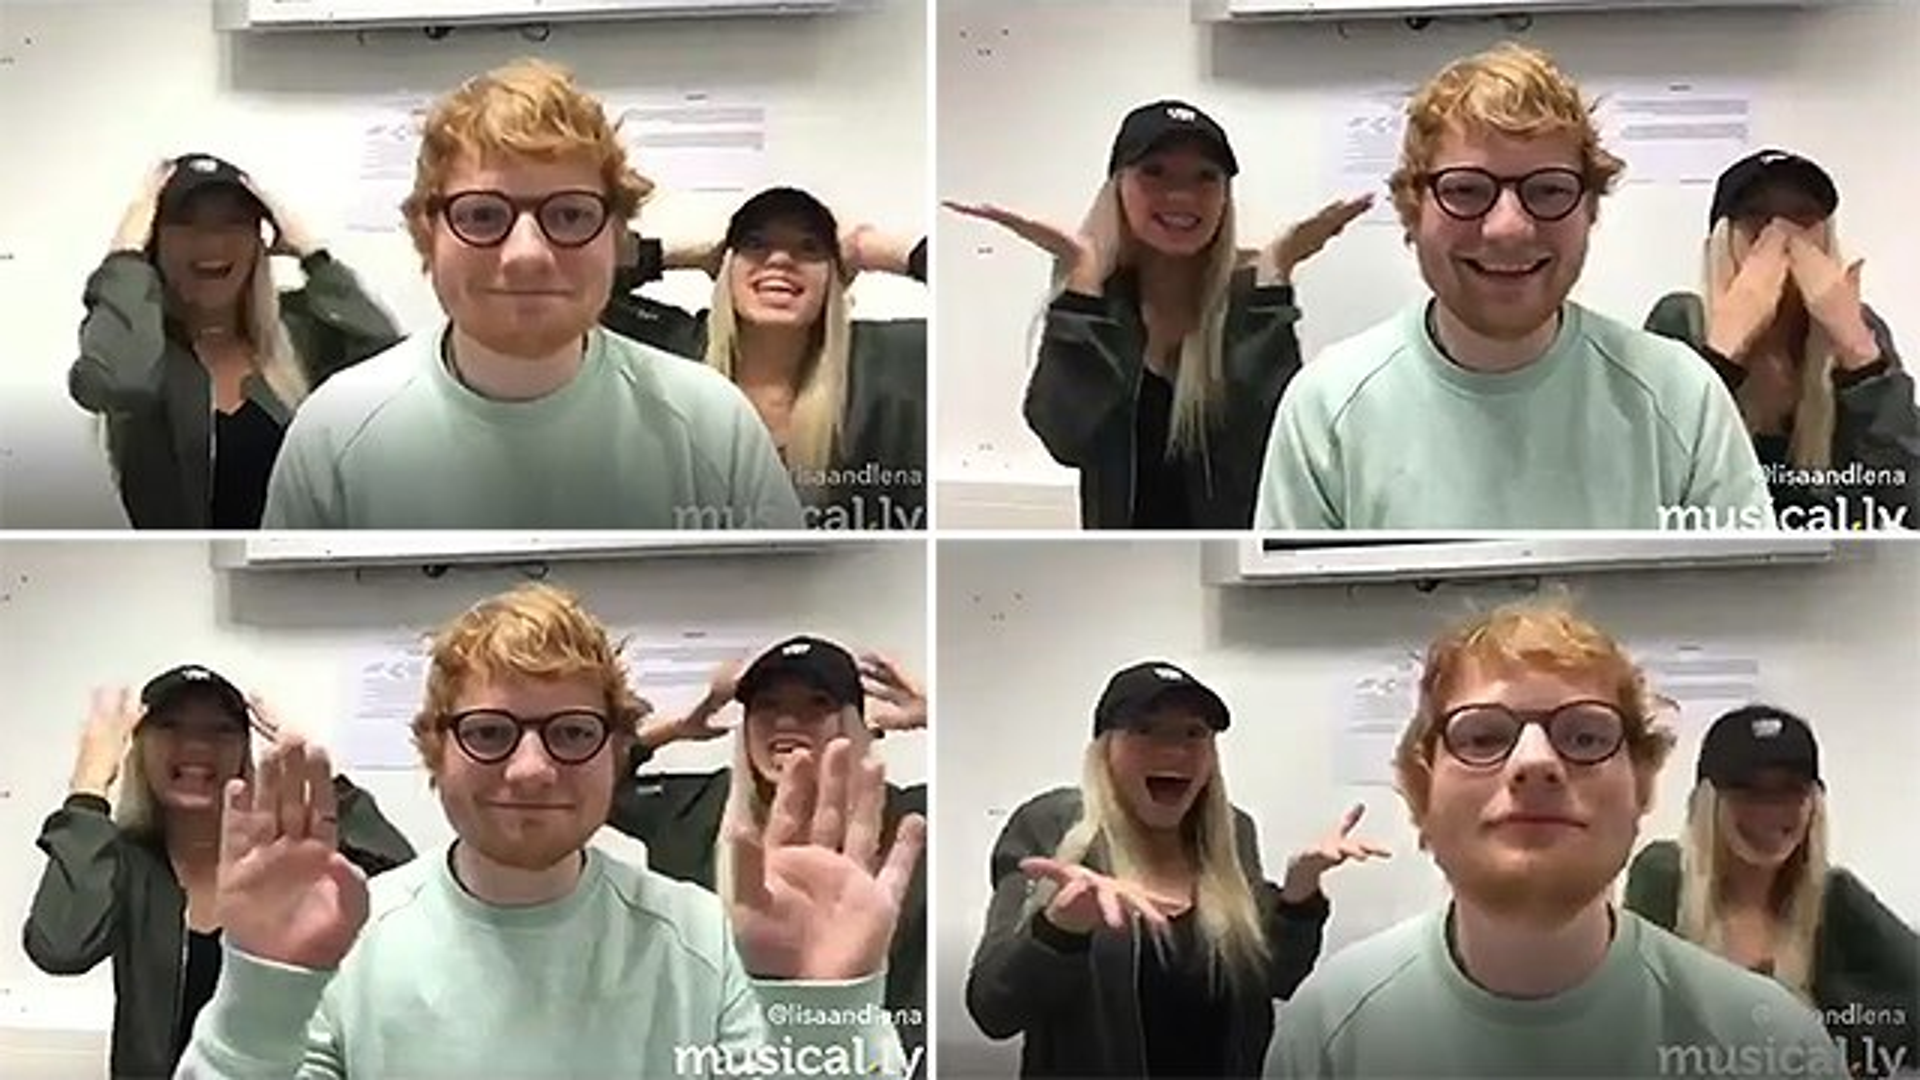 Lisa-und-Lena-Ed-Sheeran